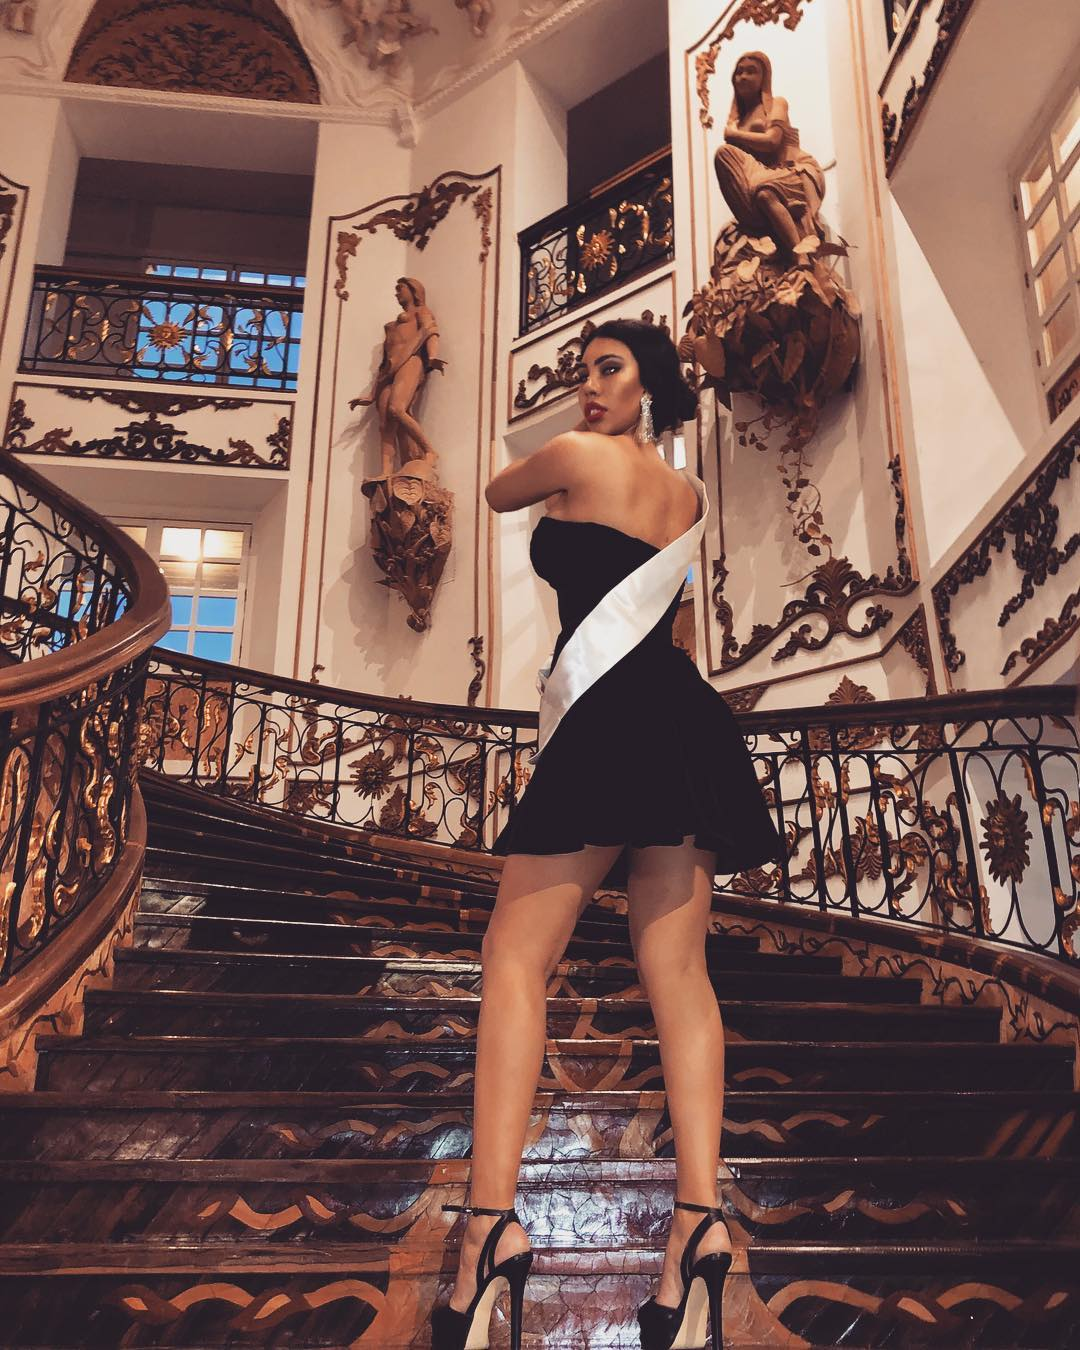 giuliana valenzuela, miss intercontinental peru 2018-2019. - Página 3 49327511